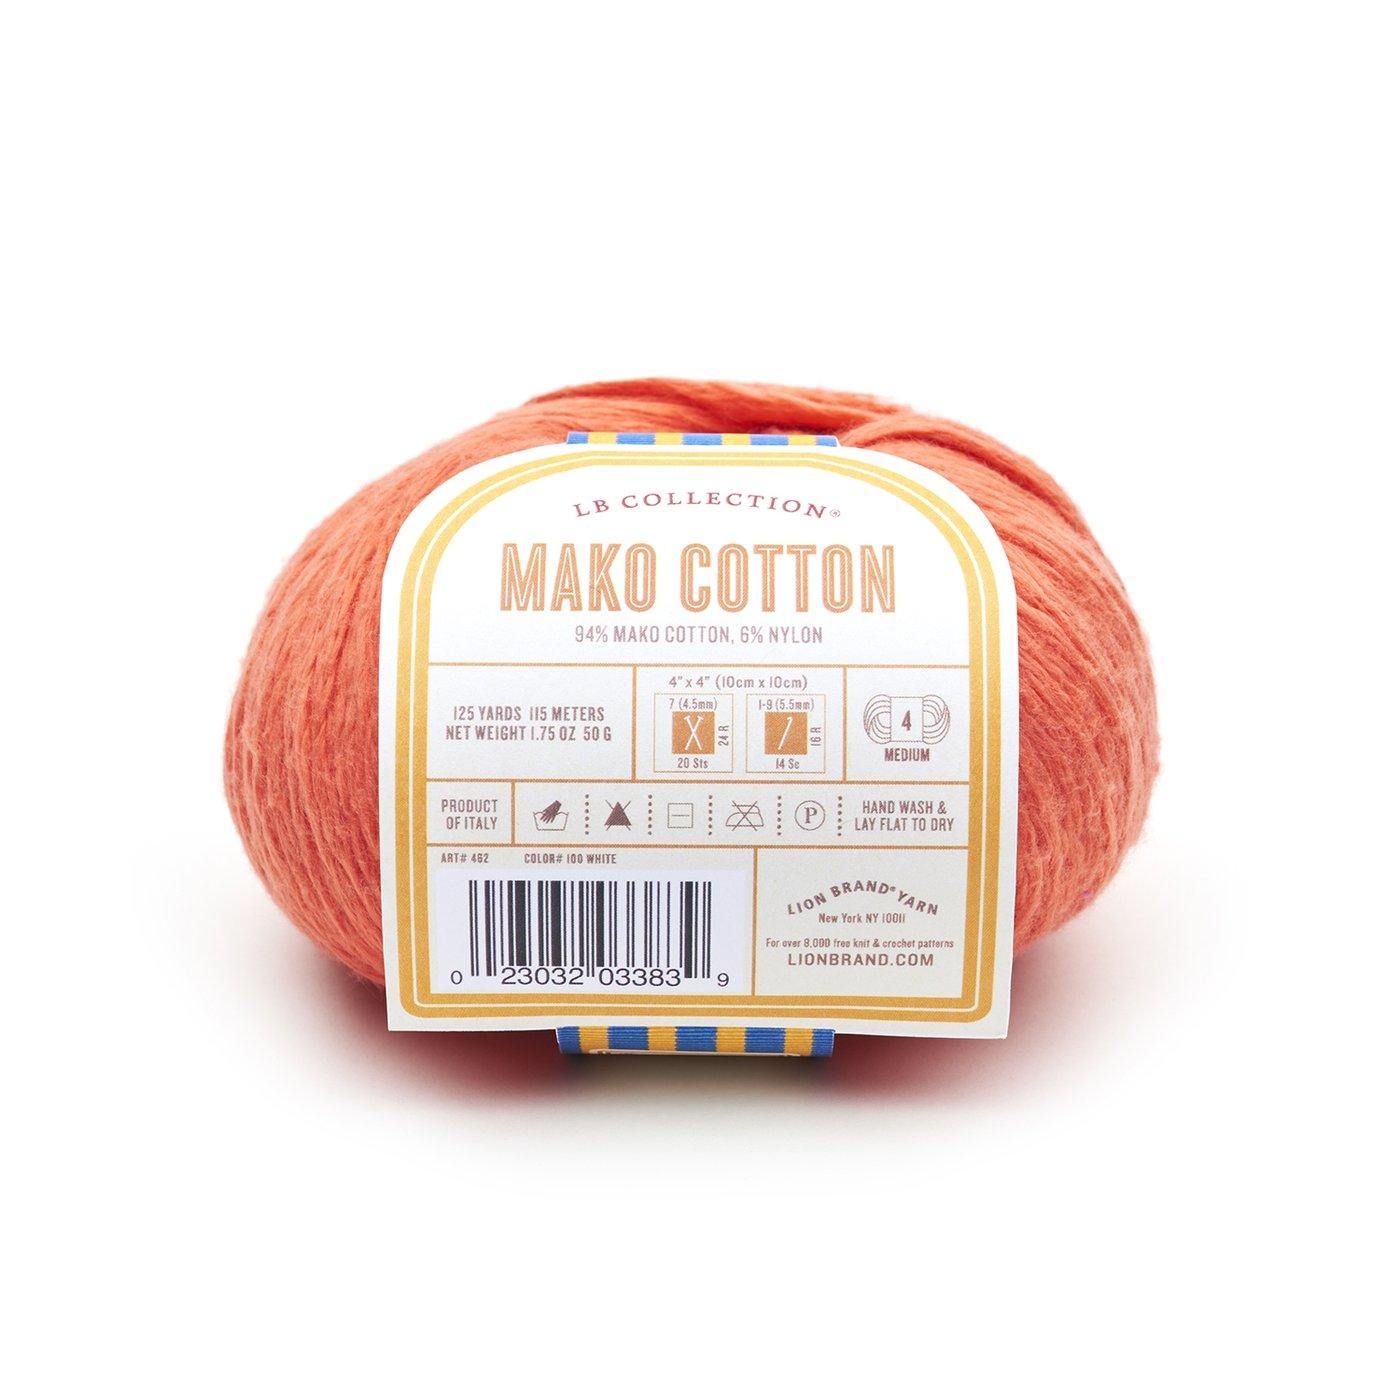 94% Mako Cotton, 6% Nylon lends a smoothness & strength